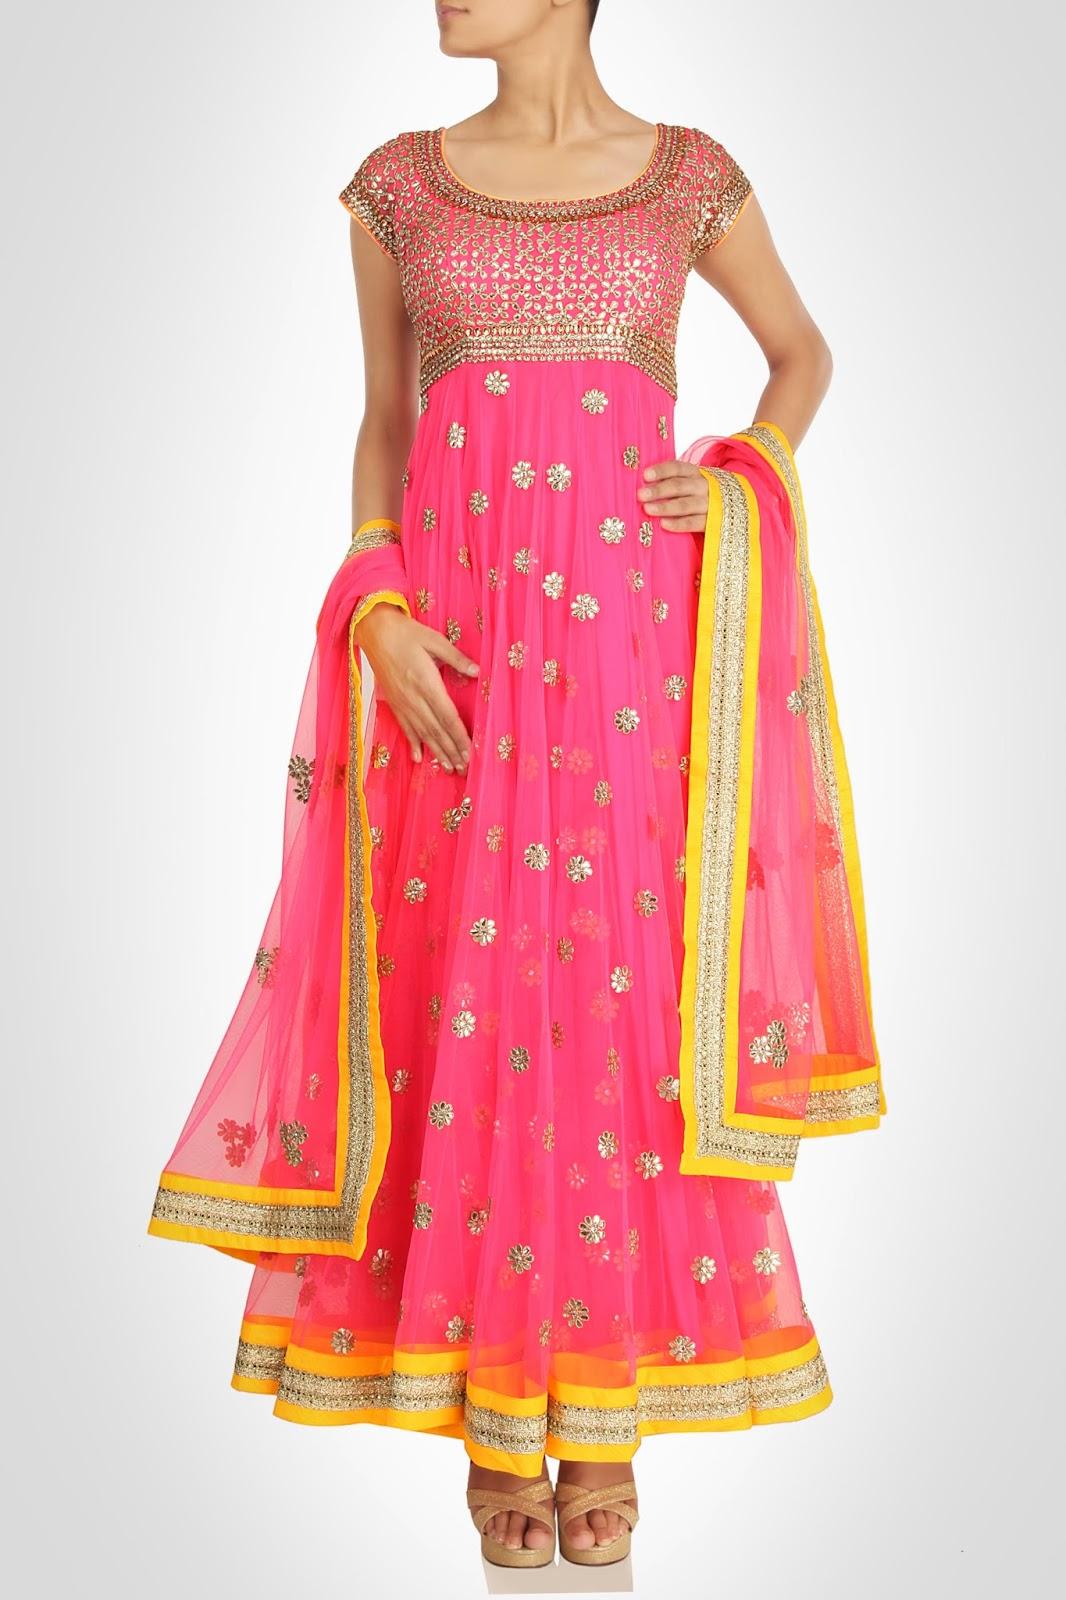 the best wedding dresses 2013 by seema gujral vega